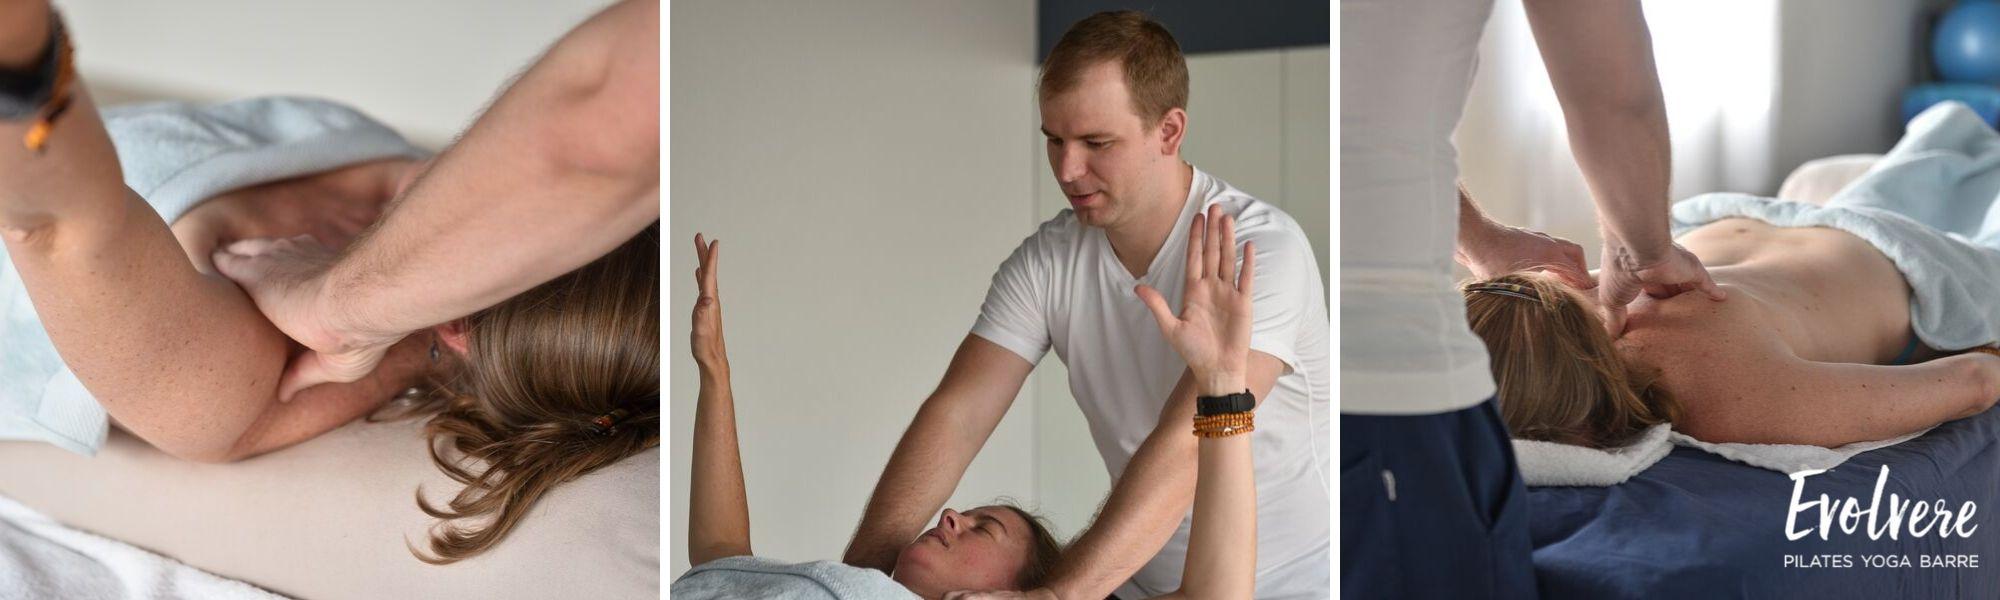 Sports Remedial Massage in Lane Cove at Evolvere Pilates studio